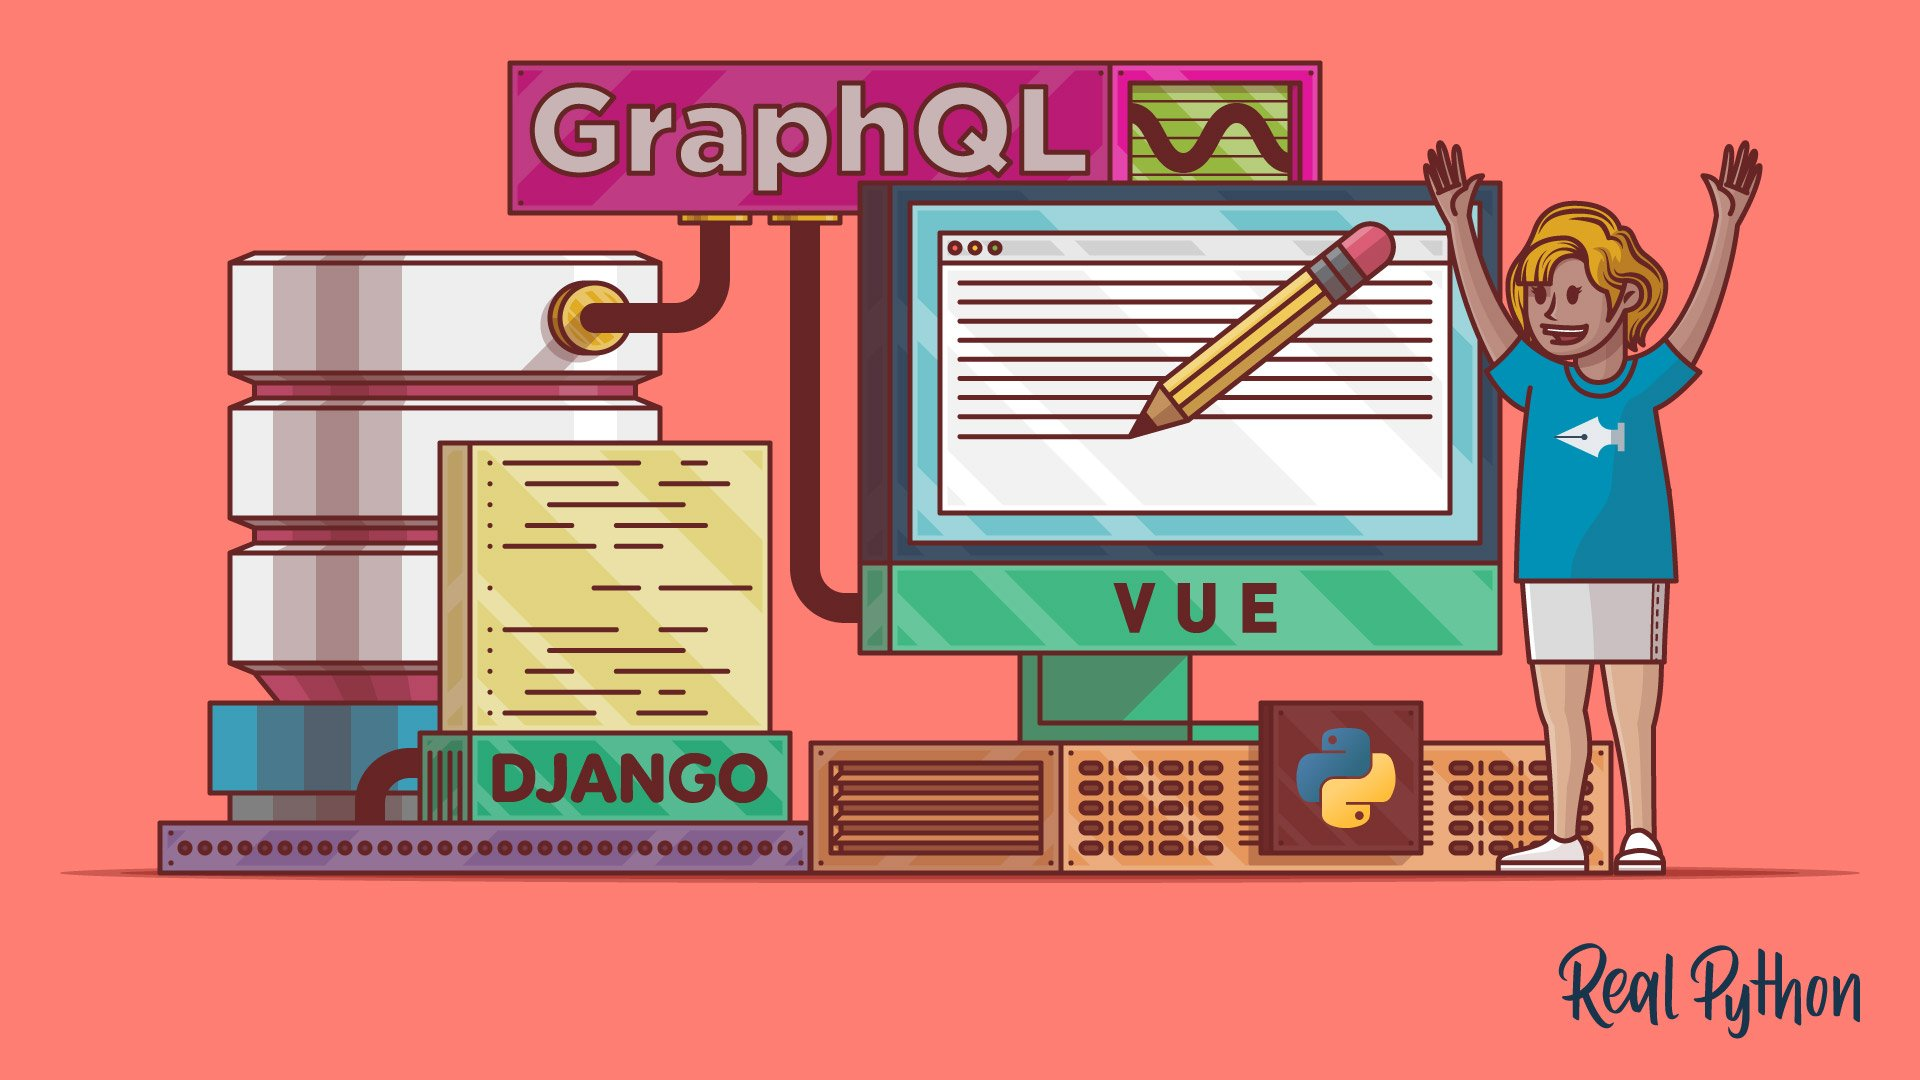 Build a Blog Using Django, Vue, and GraphQL